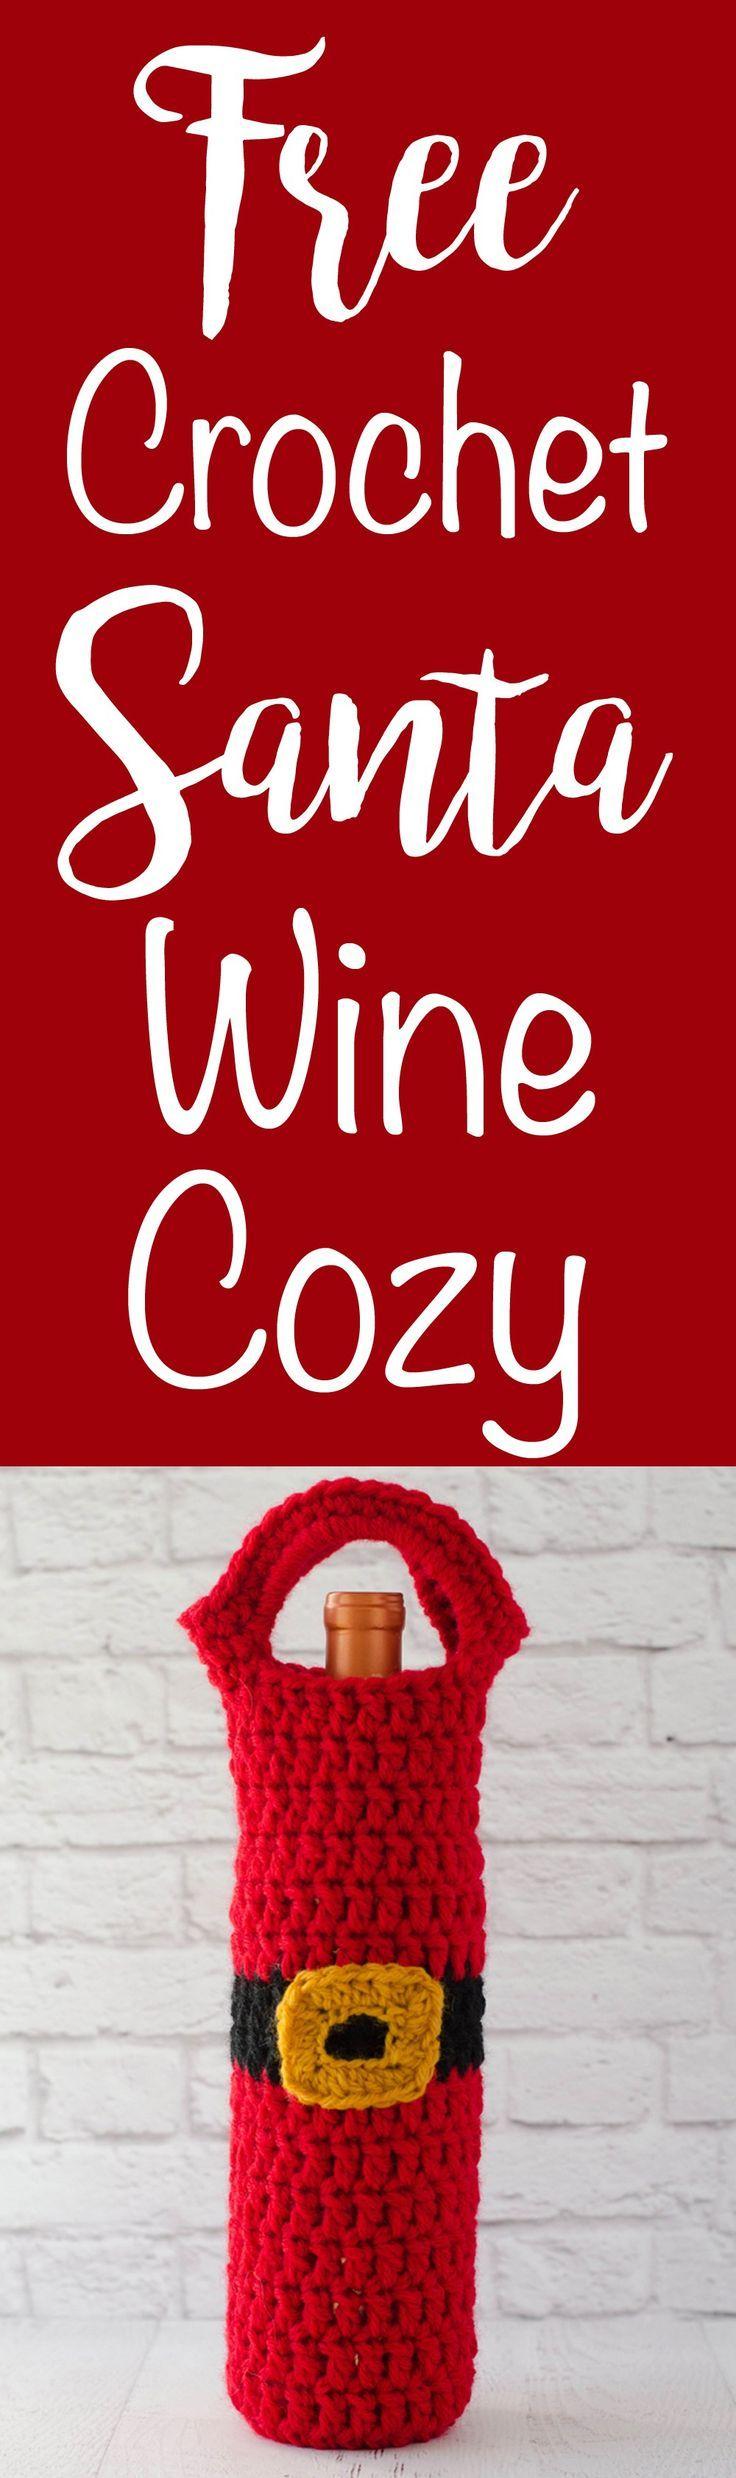 Santa Wine Cozy Crochet 365 Knit Too Crochet Santa Crochet Xmas Crochet